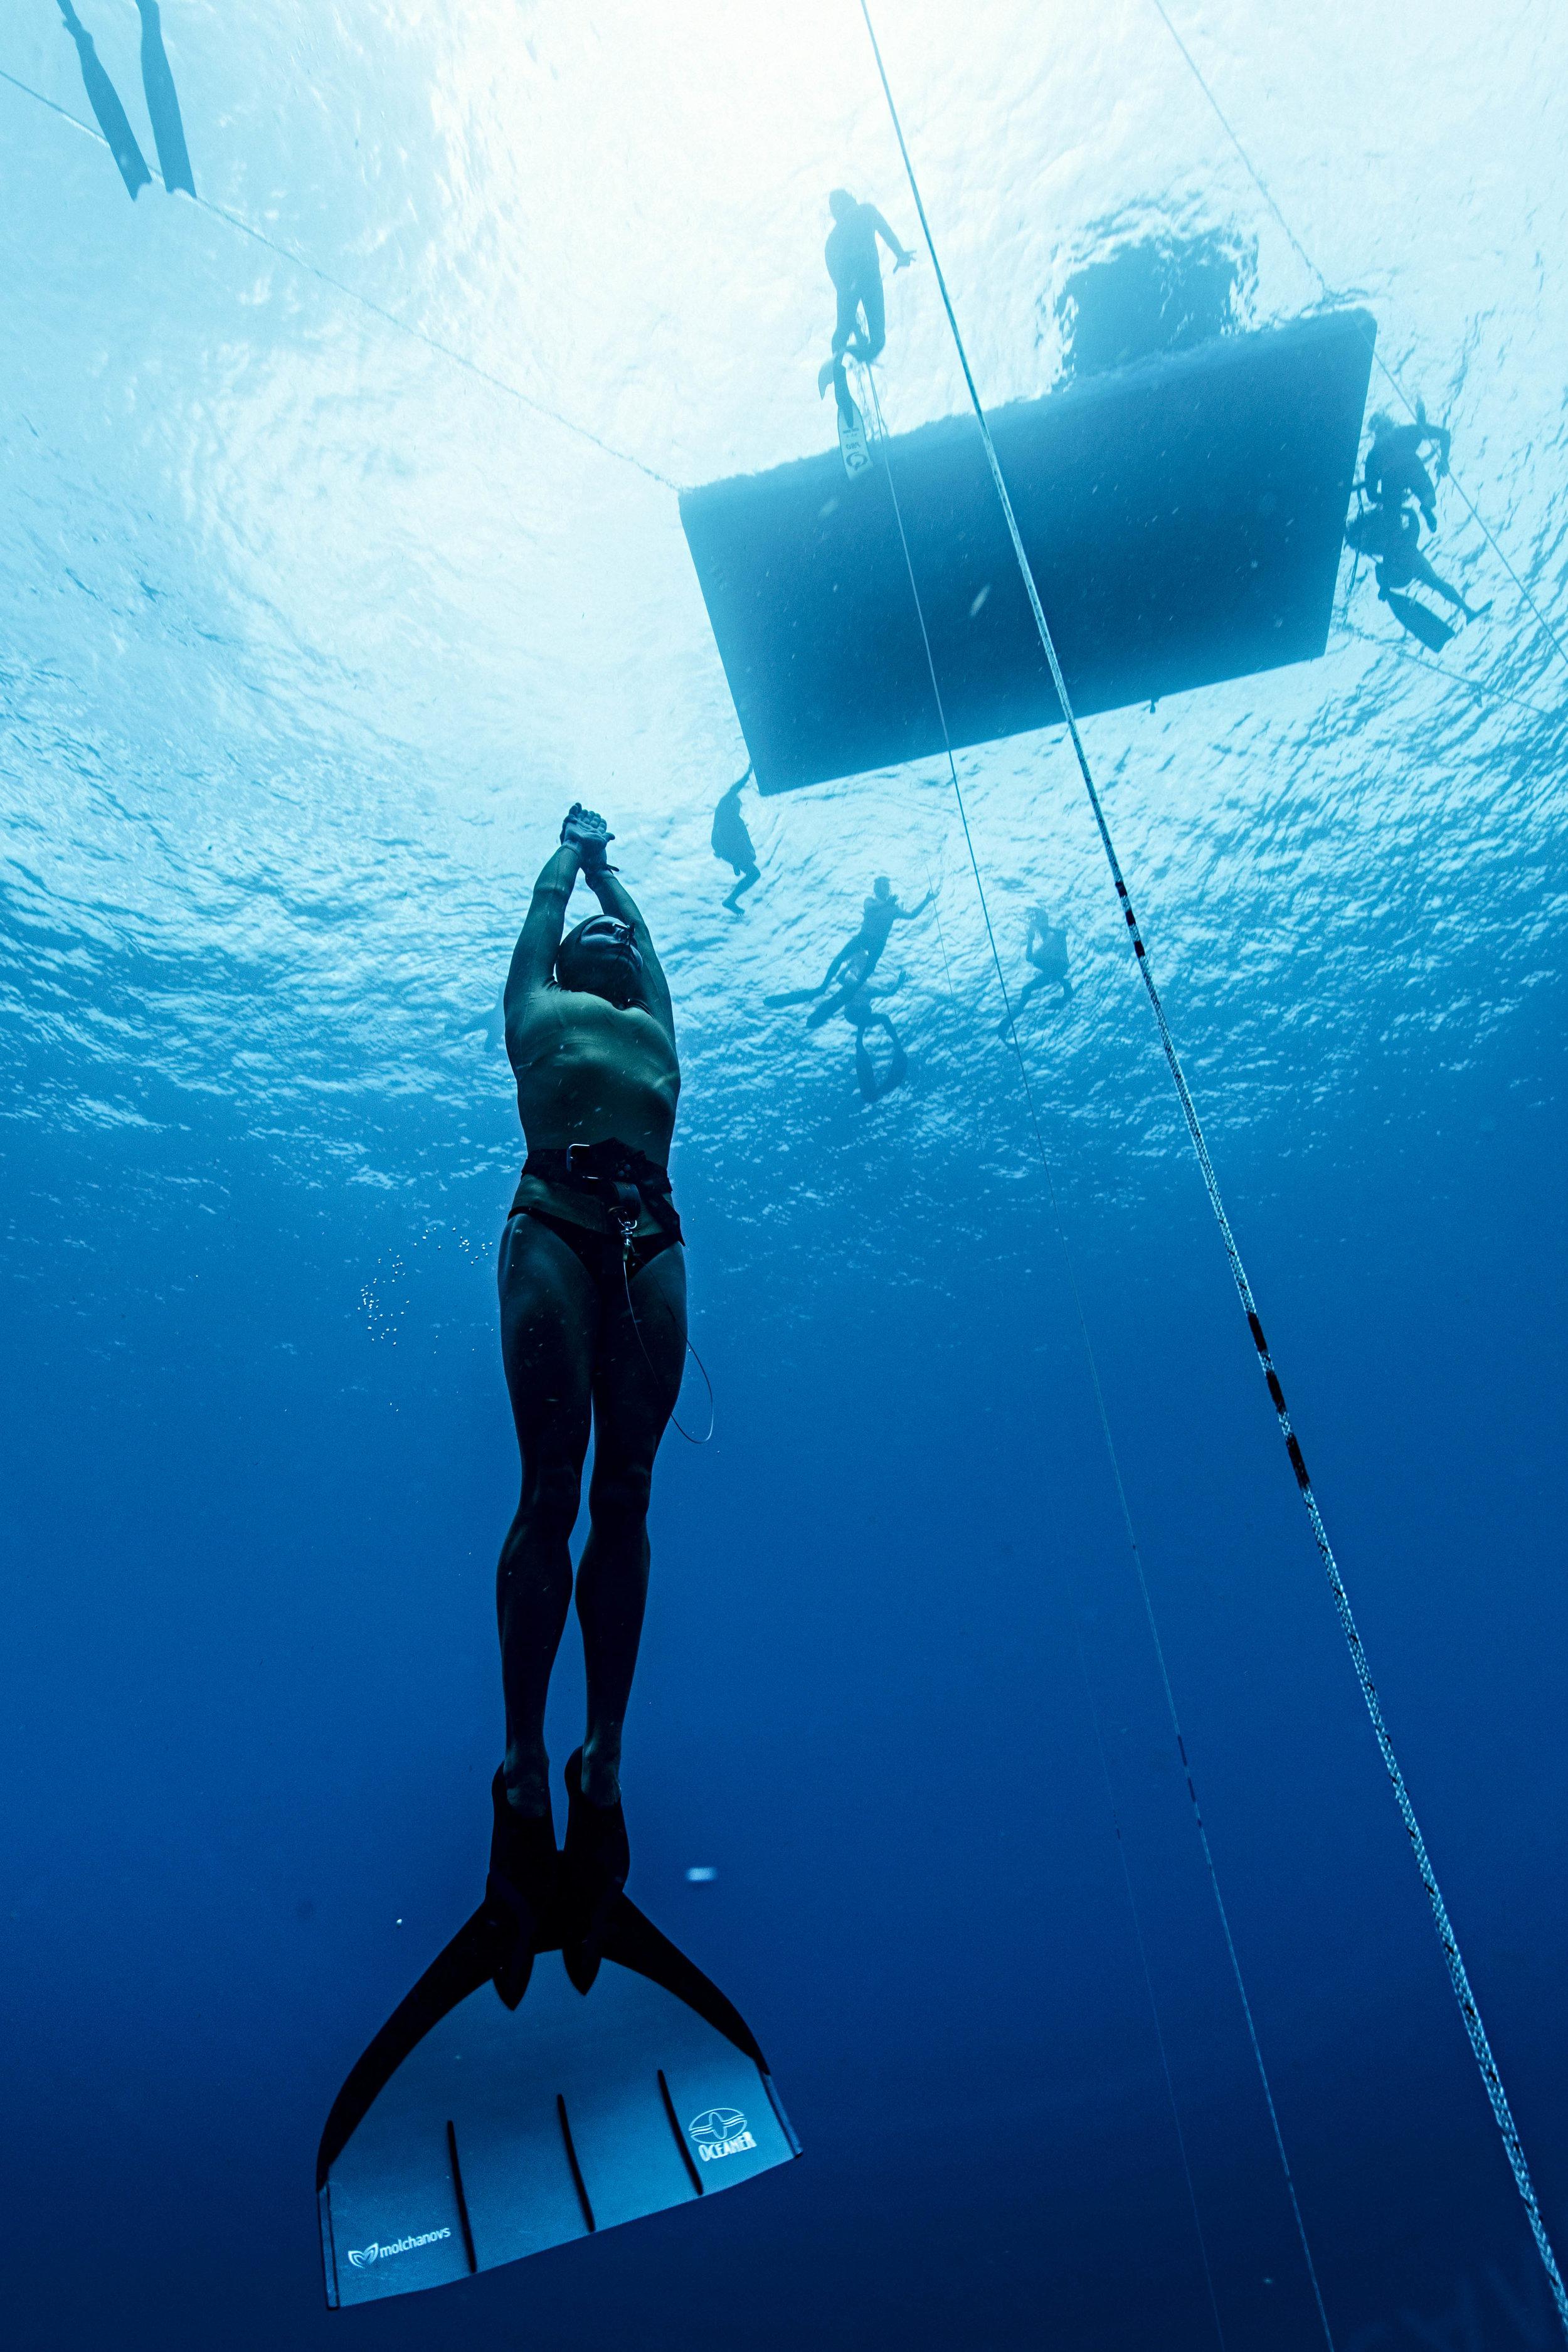 Julia Wheeler wears her Mono Fin, training in Roatan, Honduras. Representing Australia in the 2017 World Freediving Championships. Ranked 12th place overall female / 2nd Australian.